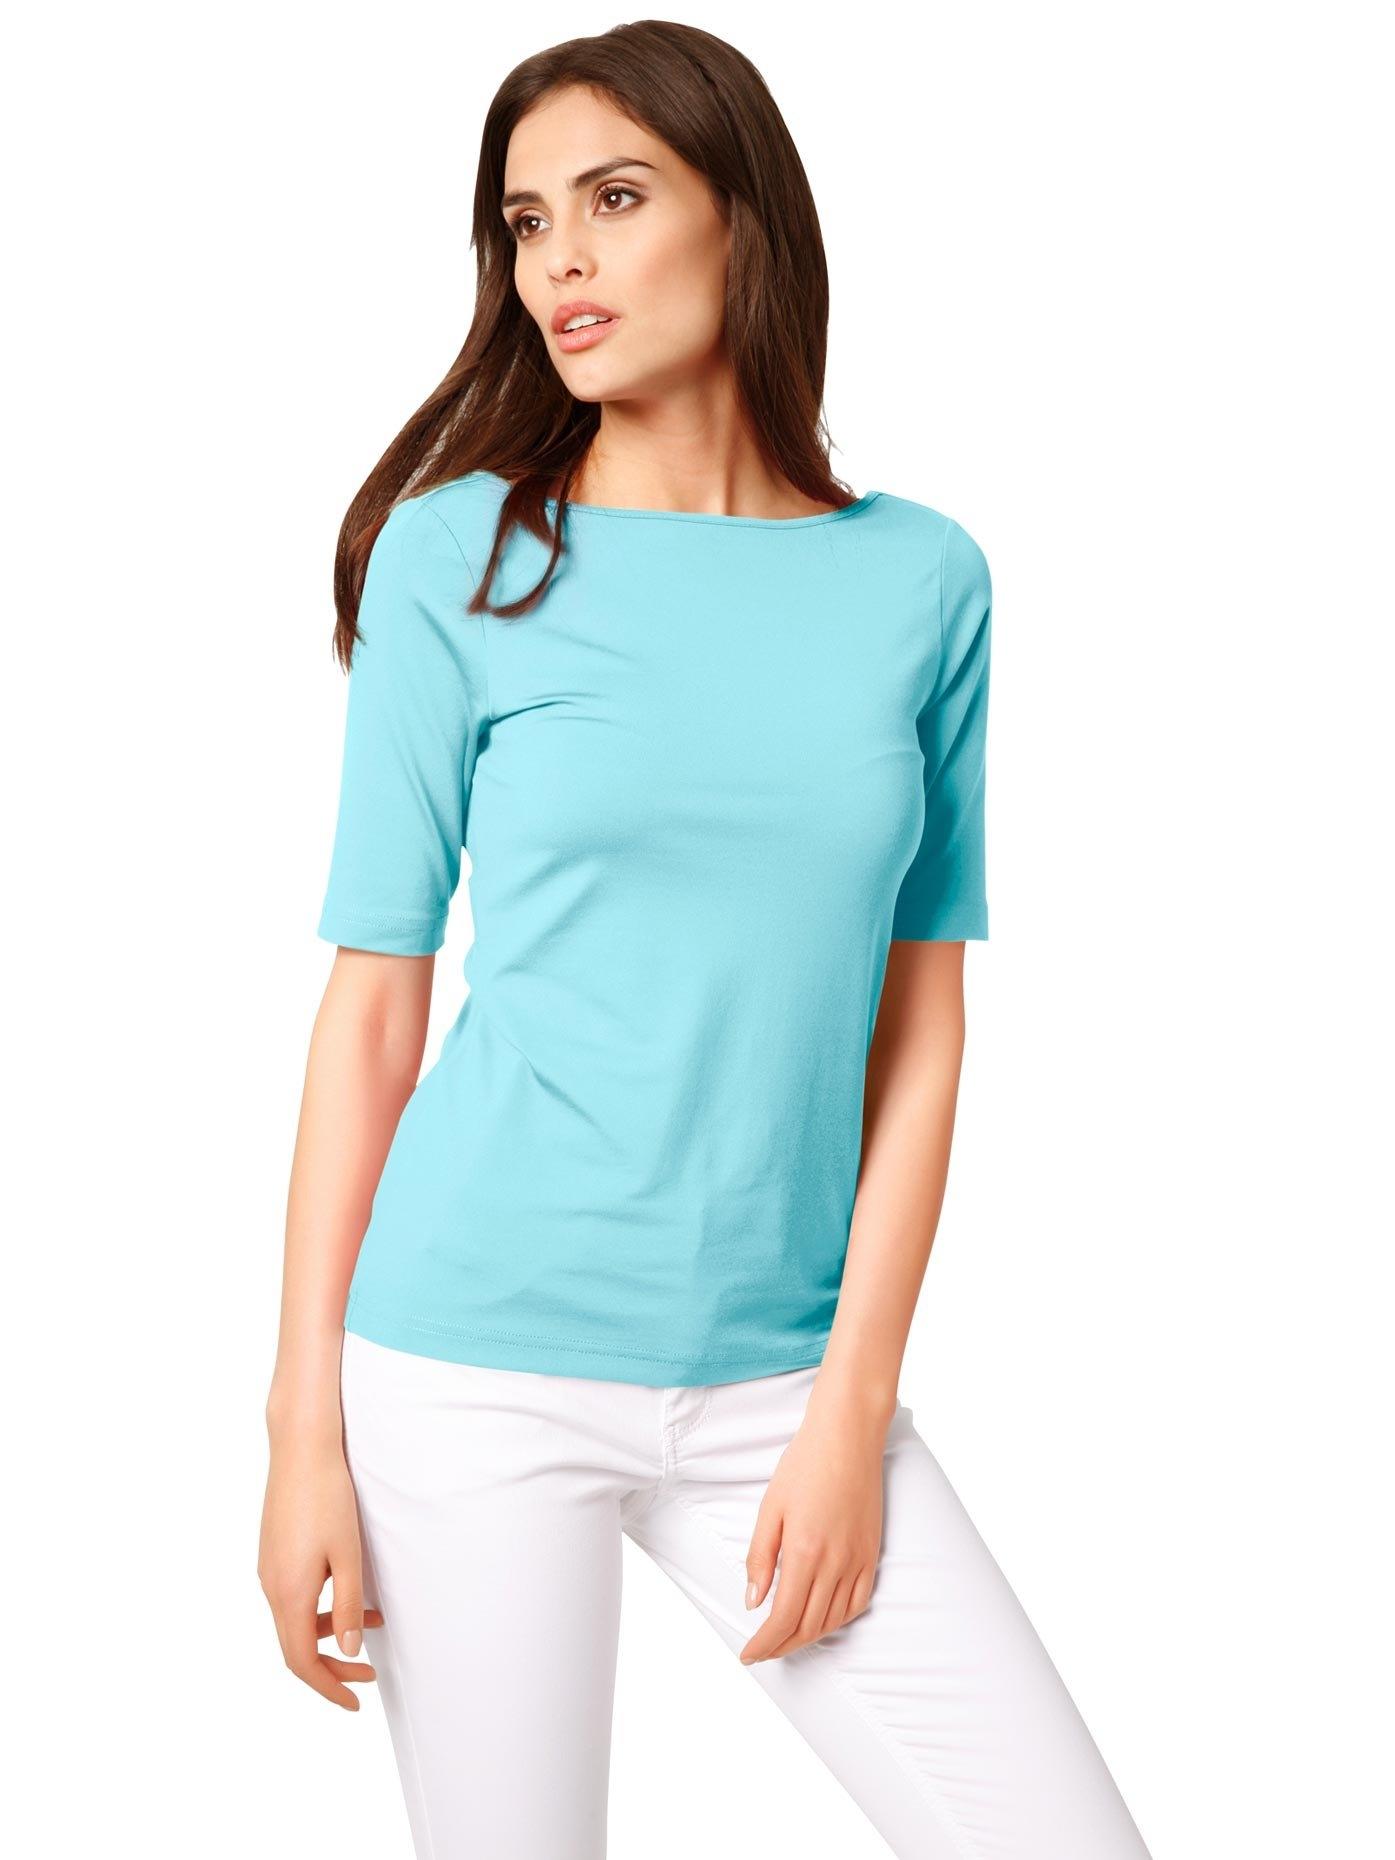 LINEA TESINI by Heine shirt met korte mouwen nu online bestellen